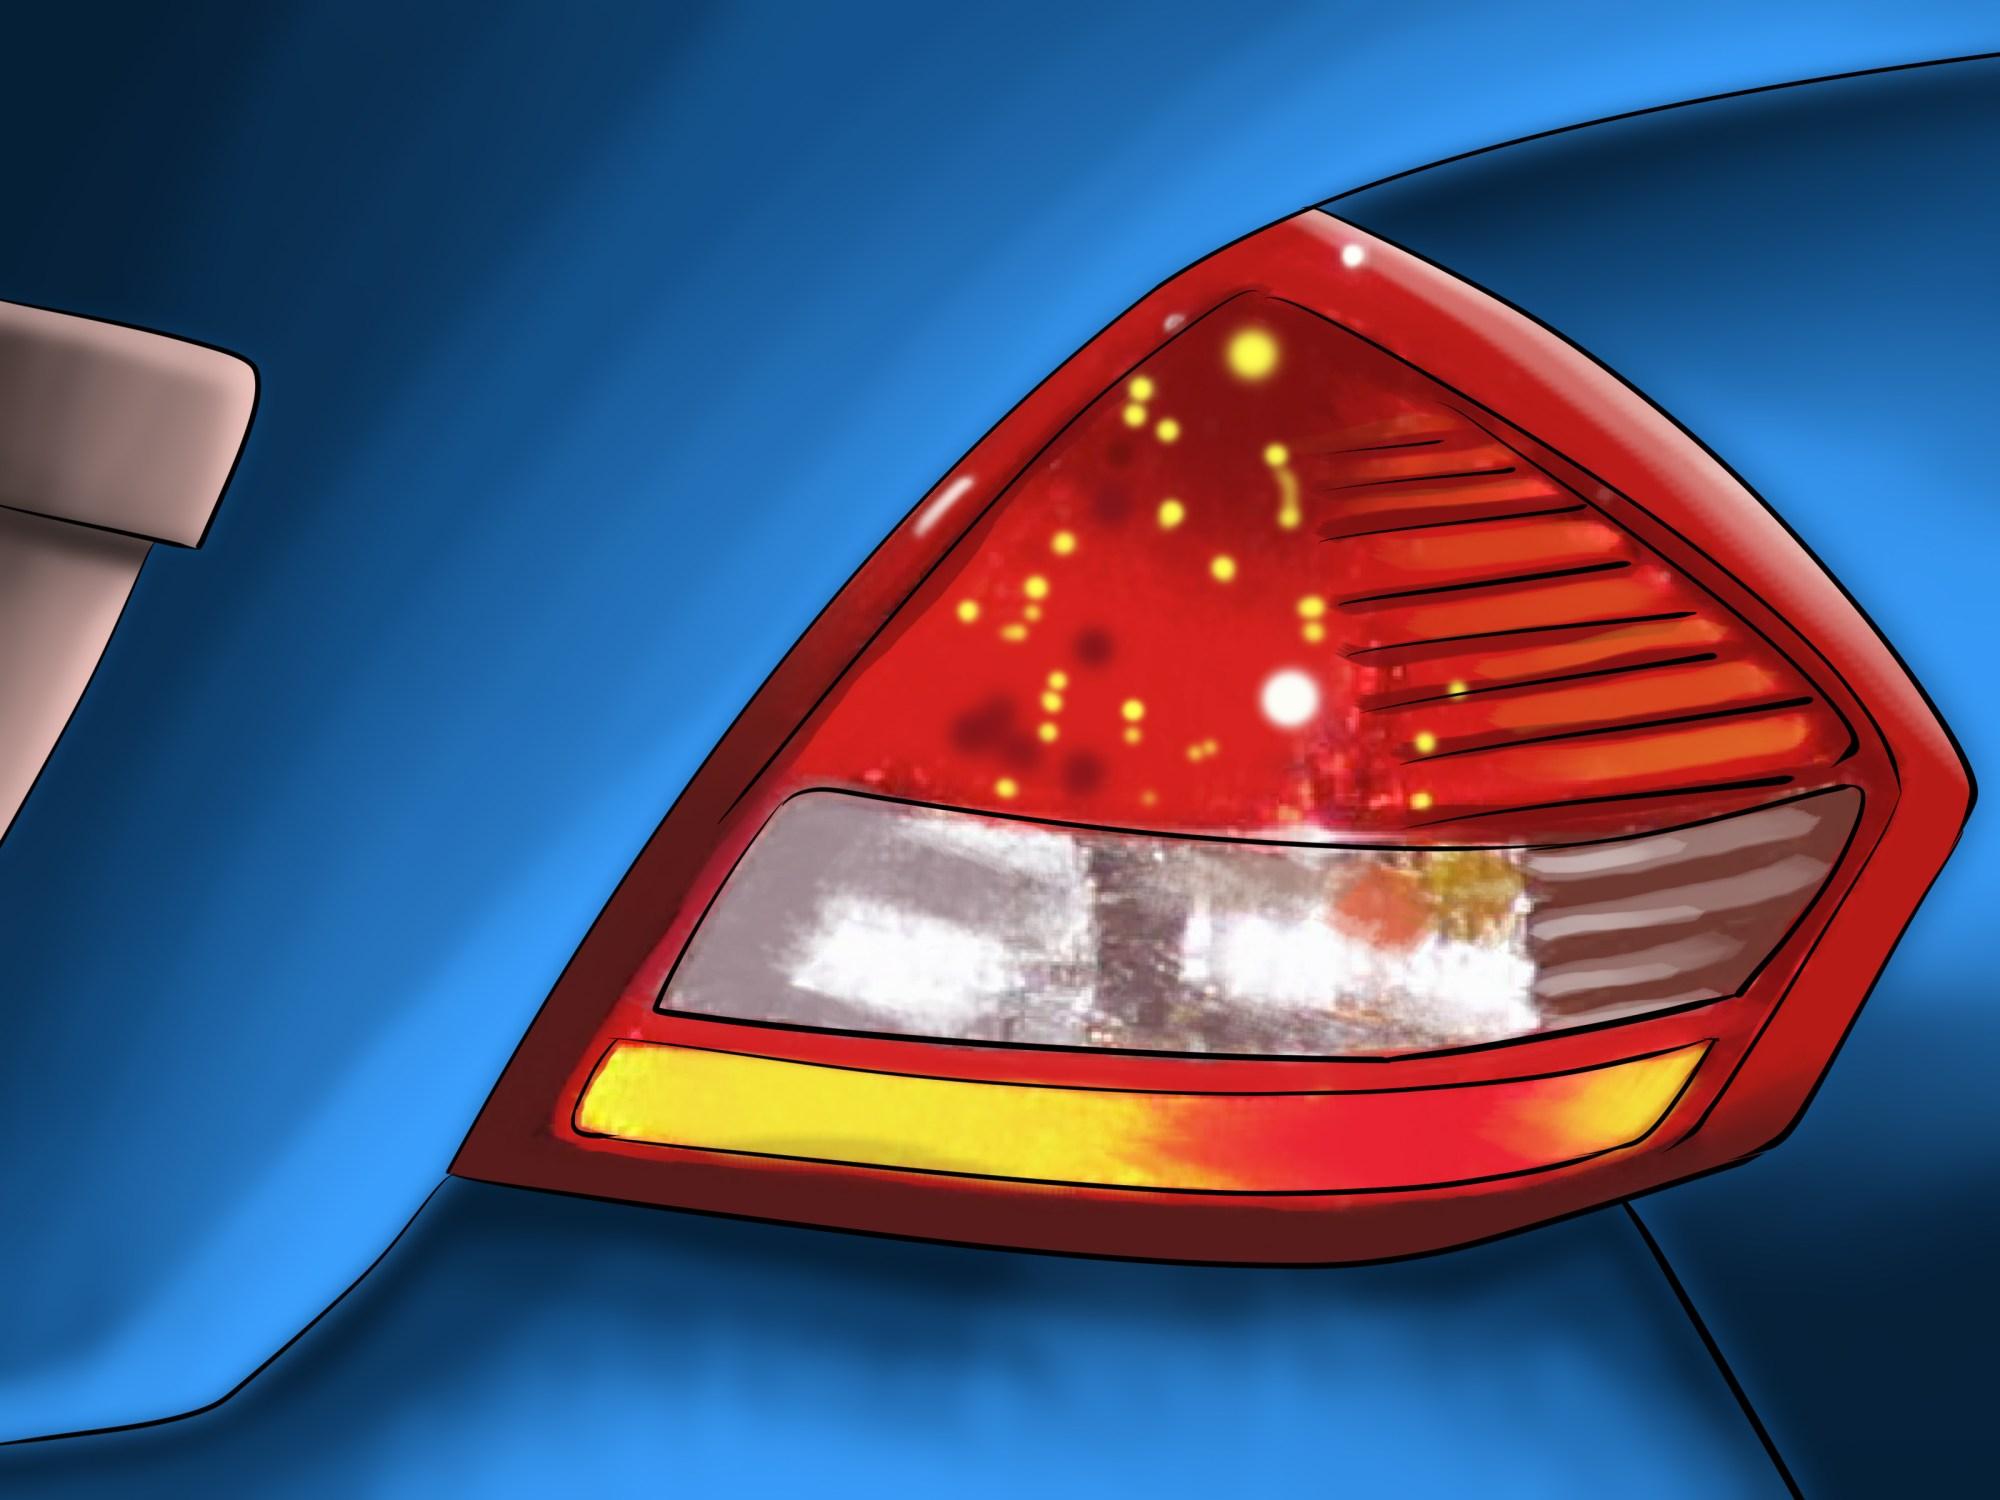 hight resolution of 2002 nissan pathfinder third brake light